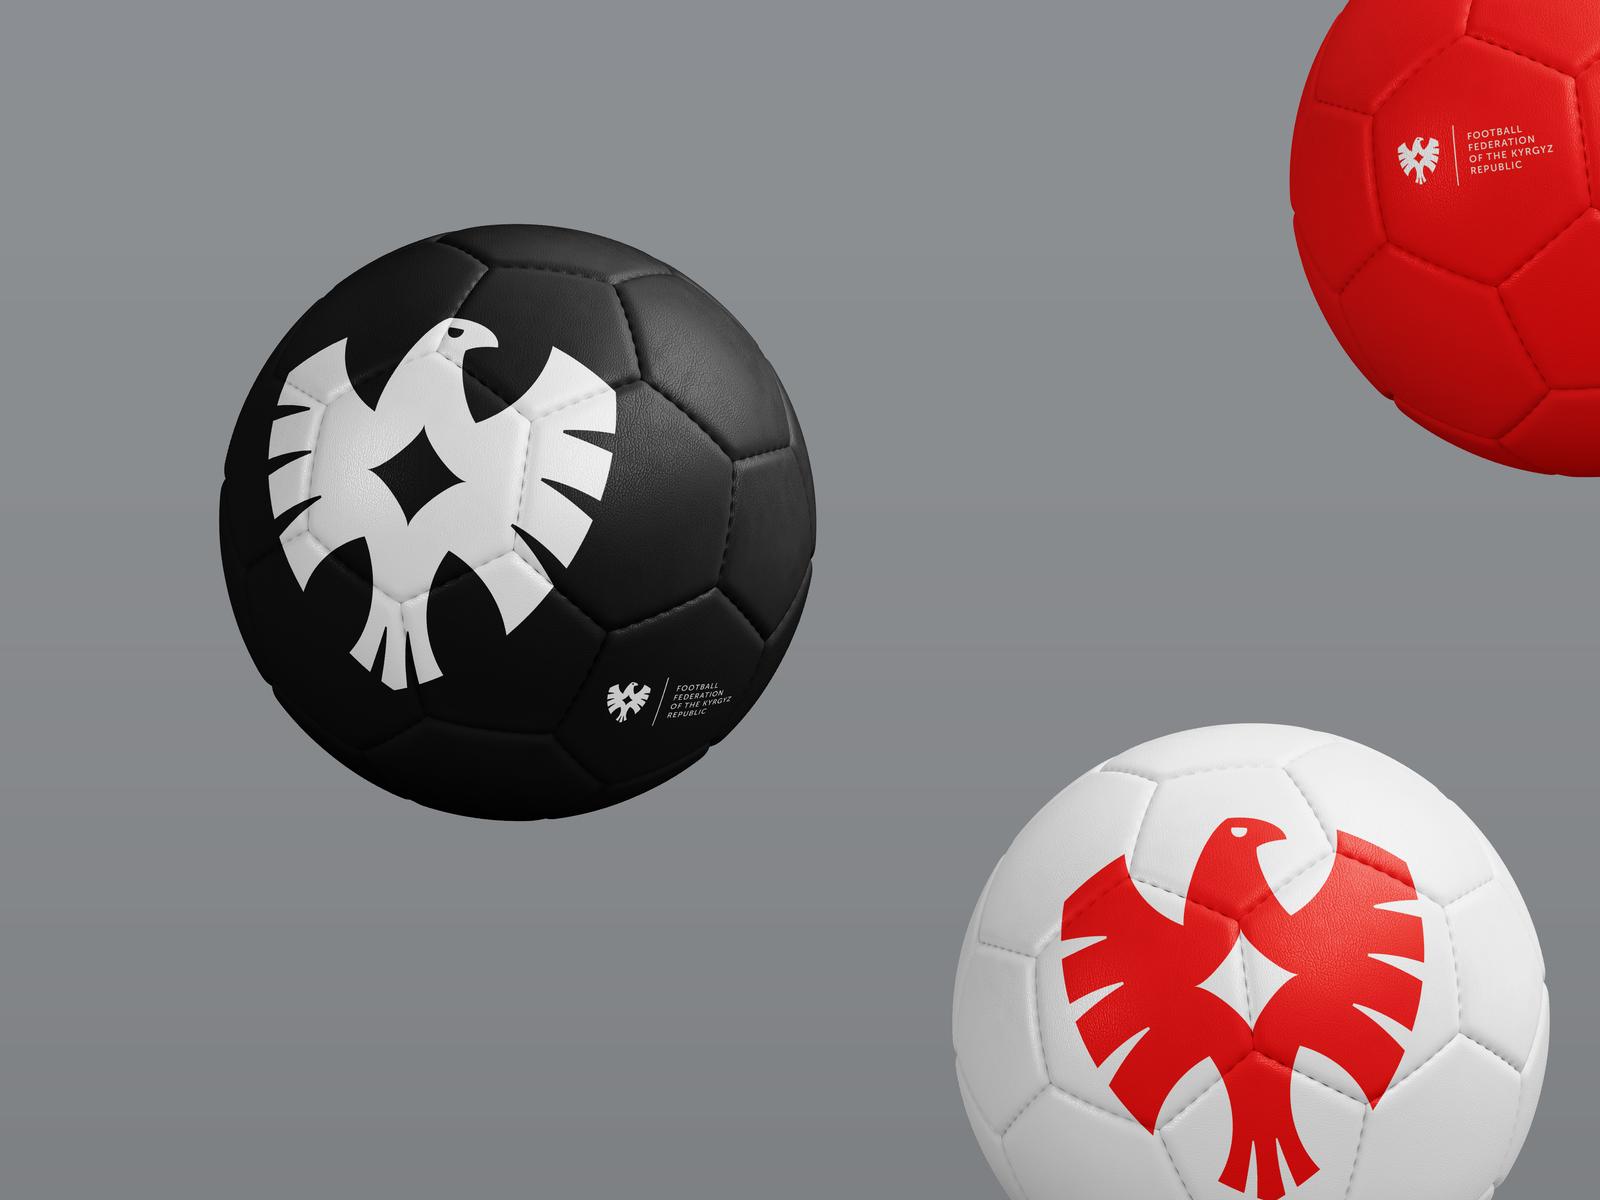 FFKR balls ffkr kyrgyzstan wings bird eagle logotype logo national team branding rebranding sport football soccer ball